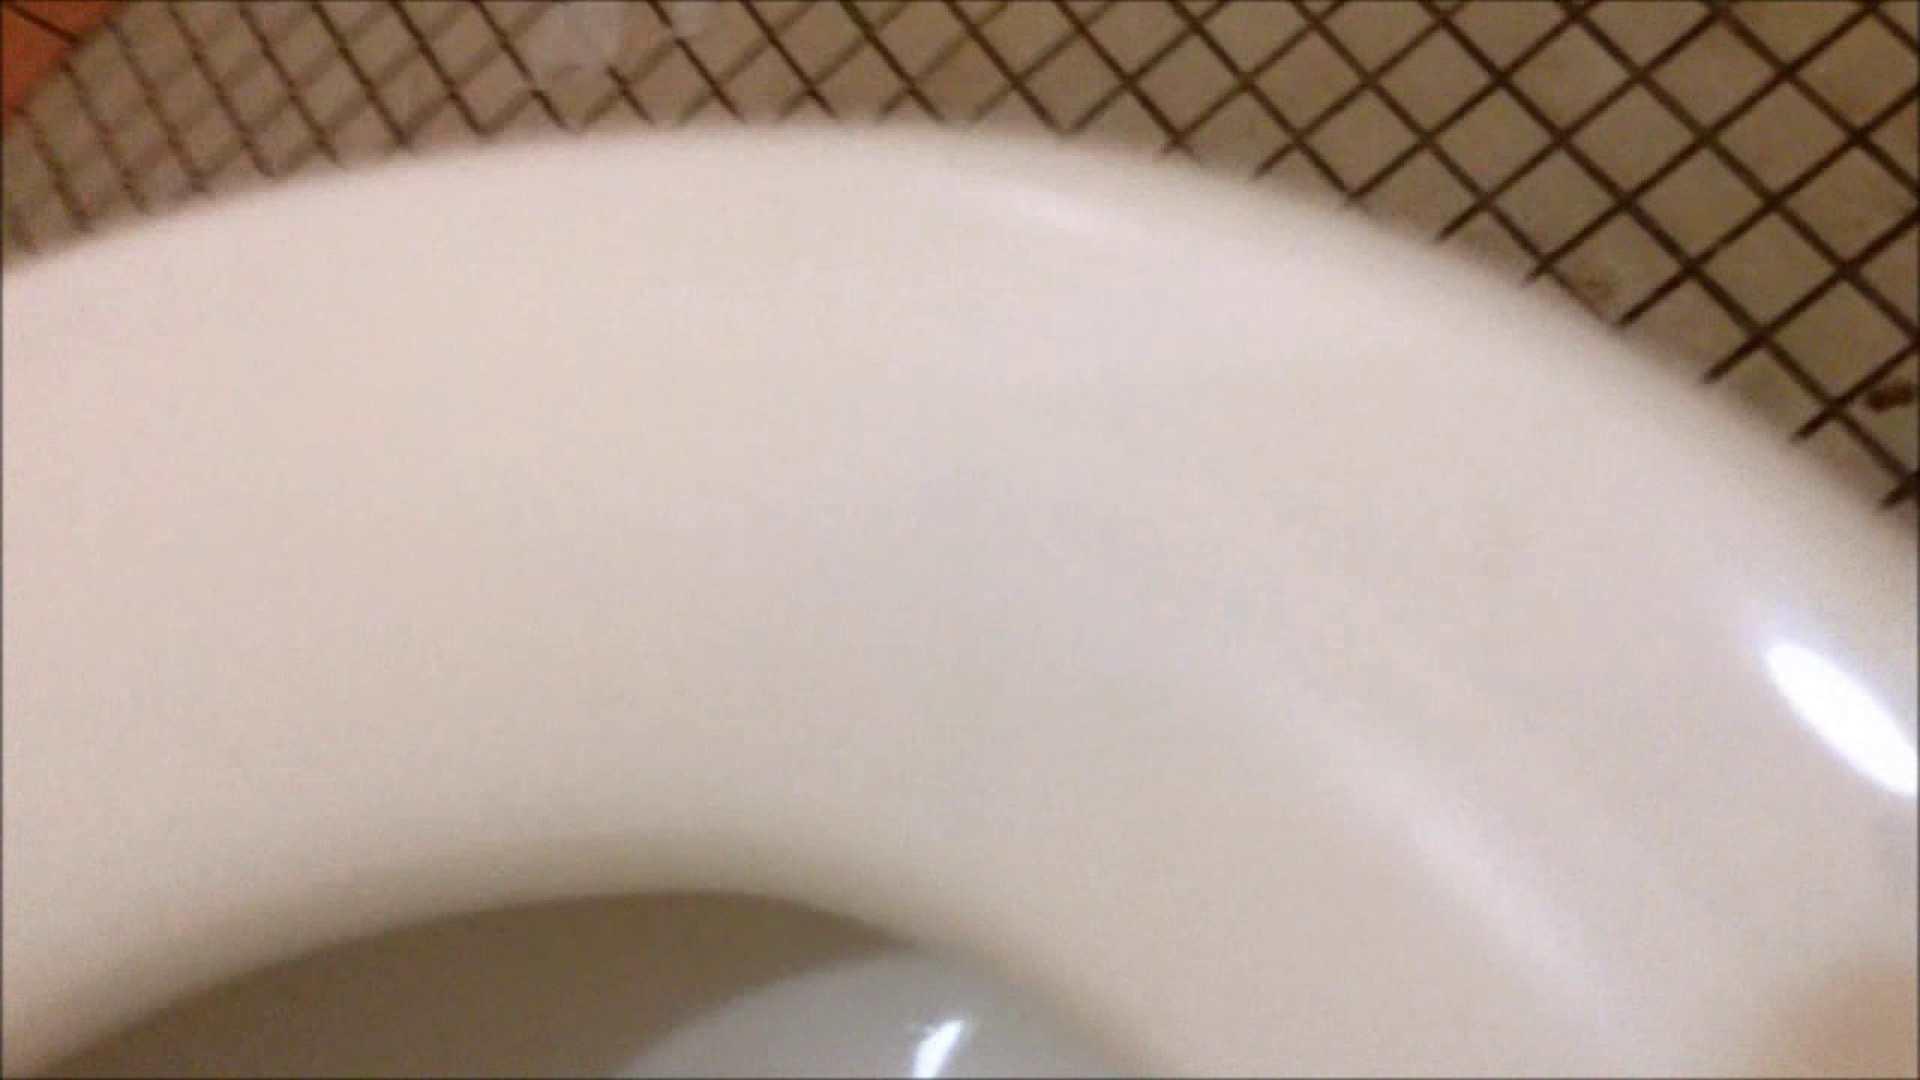 某有名大学女性洗面所 vol.11 和式 | 潜入 のぞき 85PIX 13